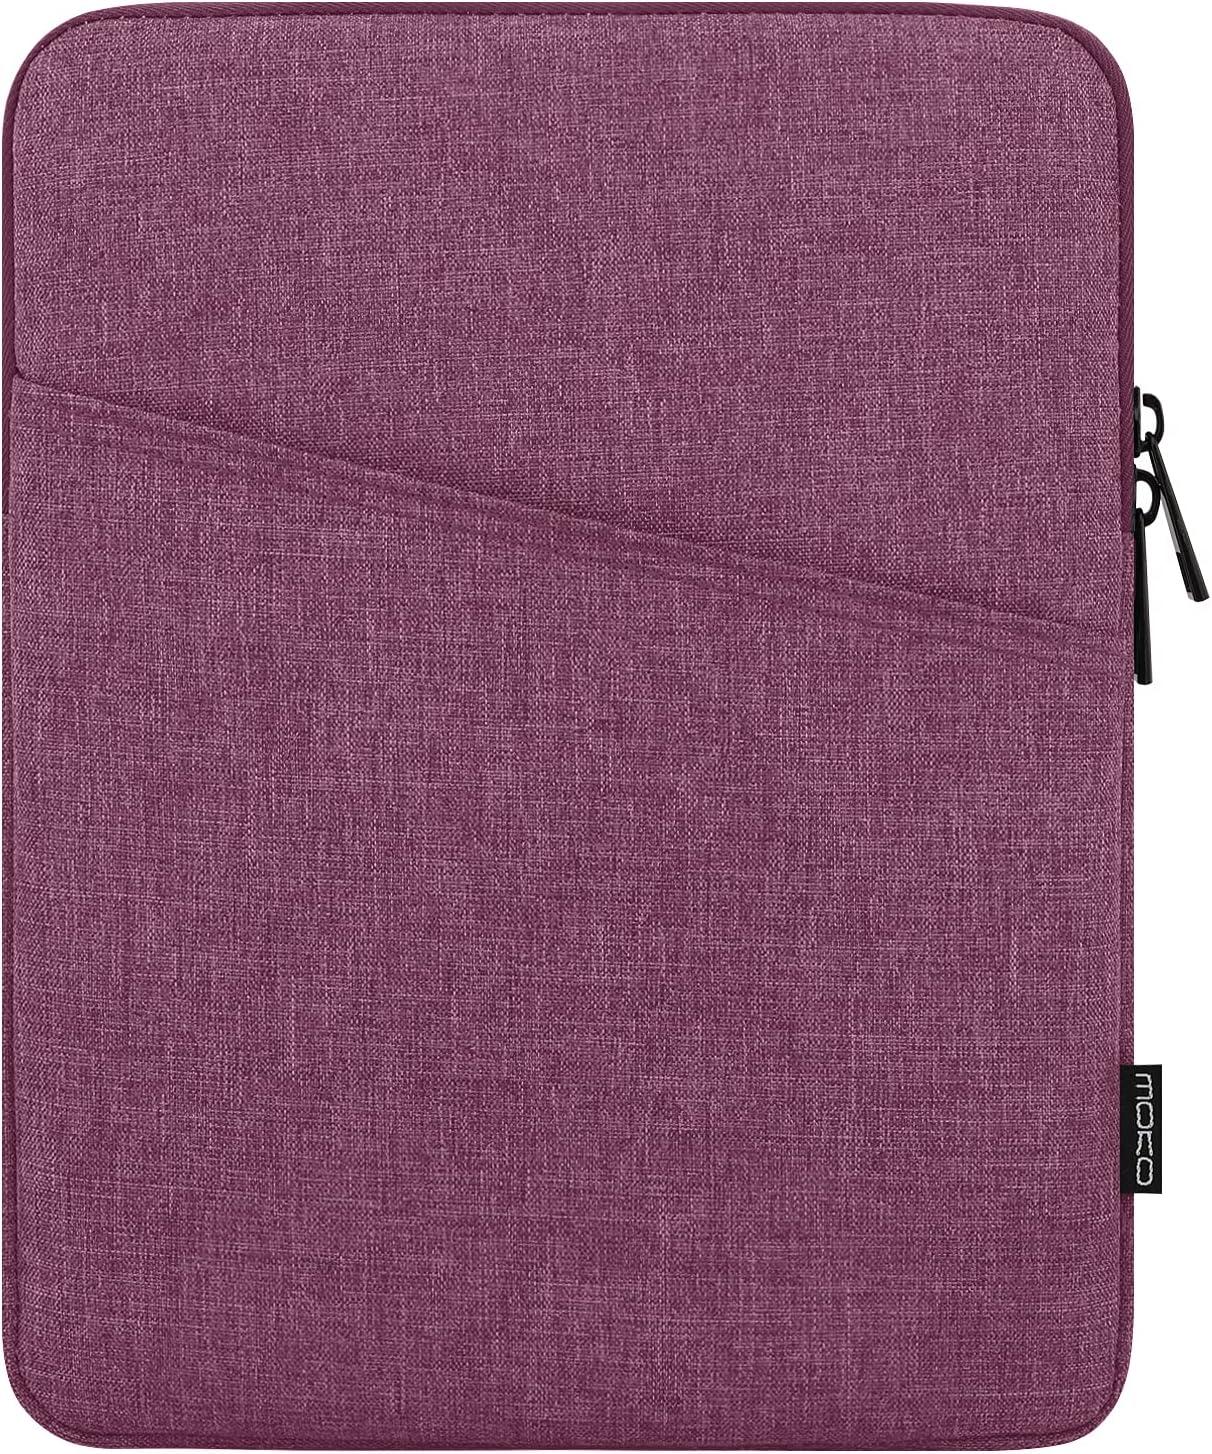 MoKo 9-11 Inch Tablet Sleeve Case Fits iPad Pro 11 2021/2020/2018, iPad 8th 7th Generation 10.2, iPad Air 4 10.9, iPad Air 3 10.5, iPad 9.7, Galaxy Tab A 10.1, Polyester Bag with Pocket, Purple